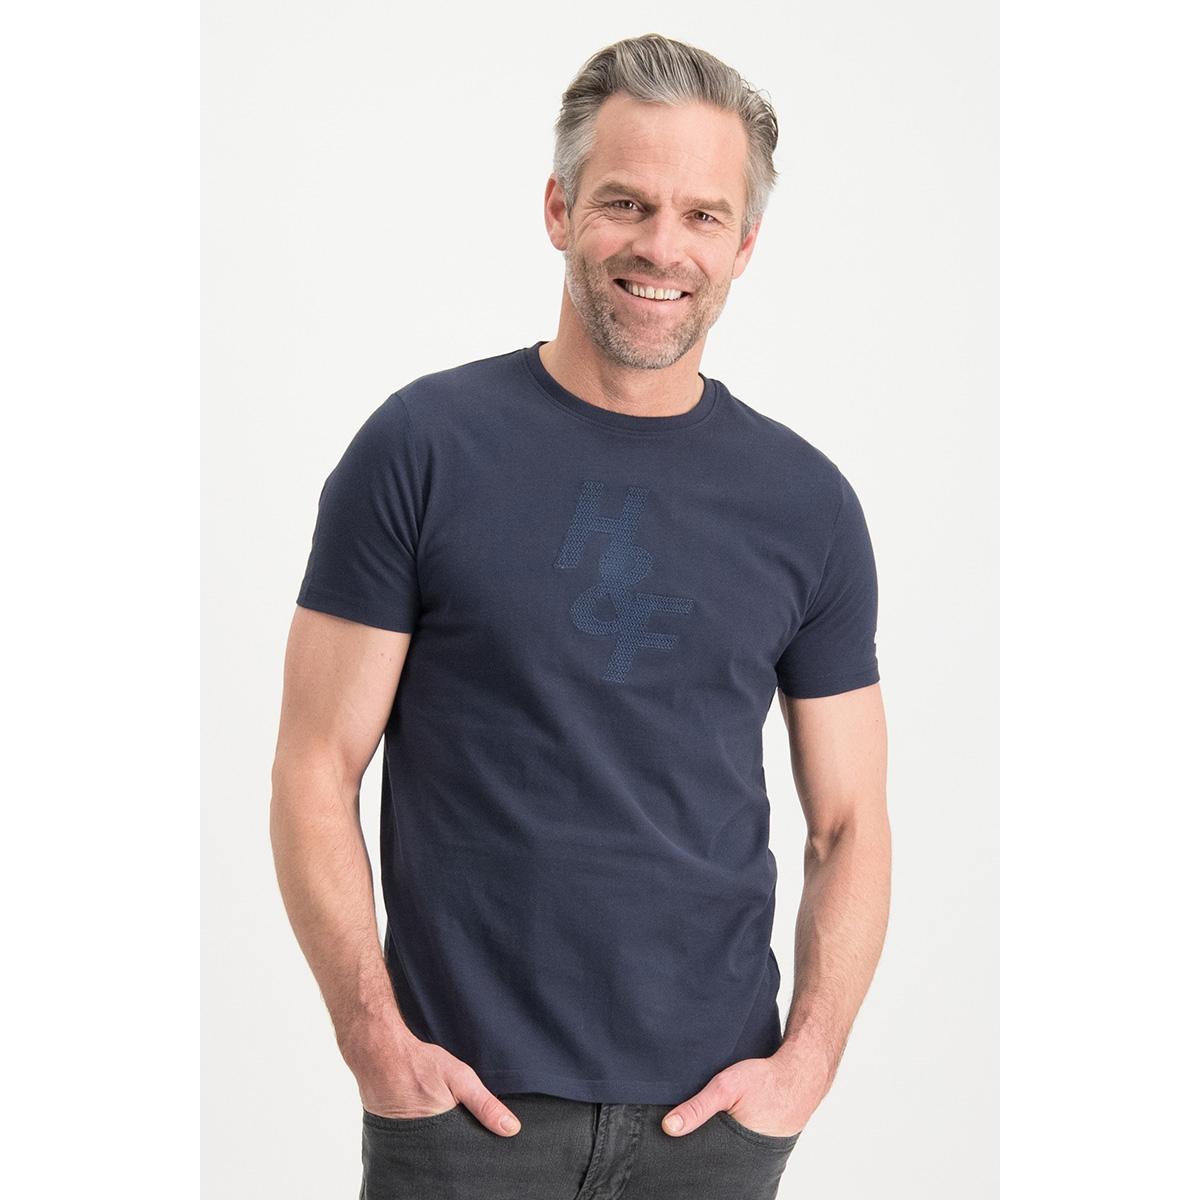 tee hf jacquard embro mc13 0004 haze & finn t-shirt sapphire